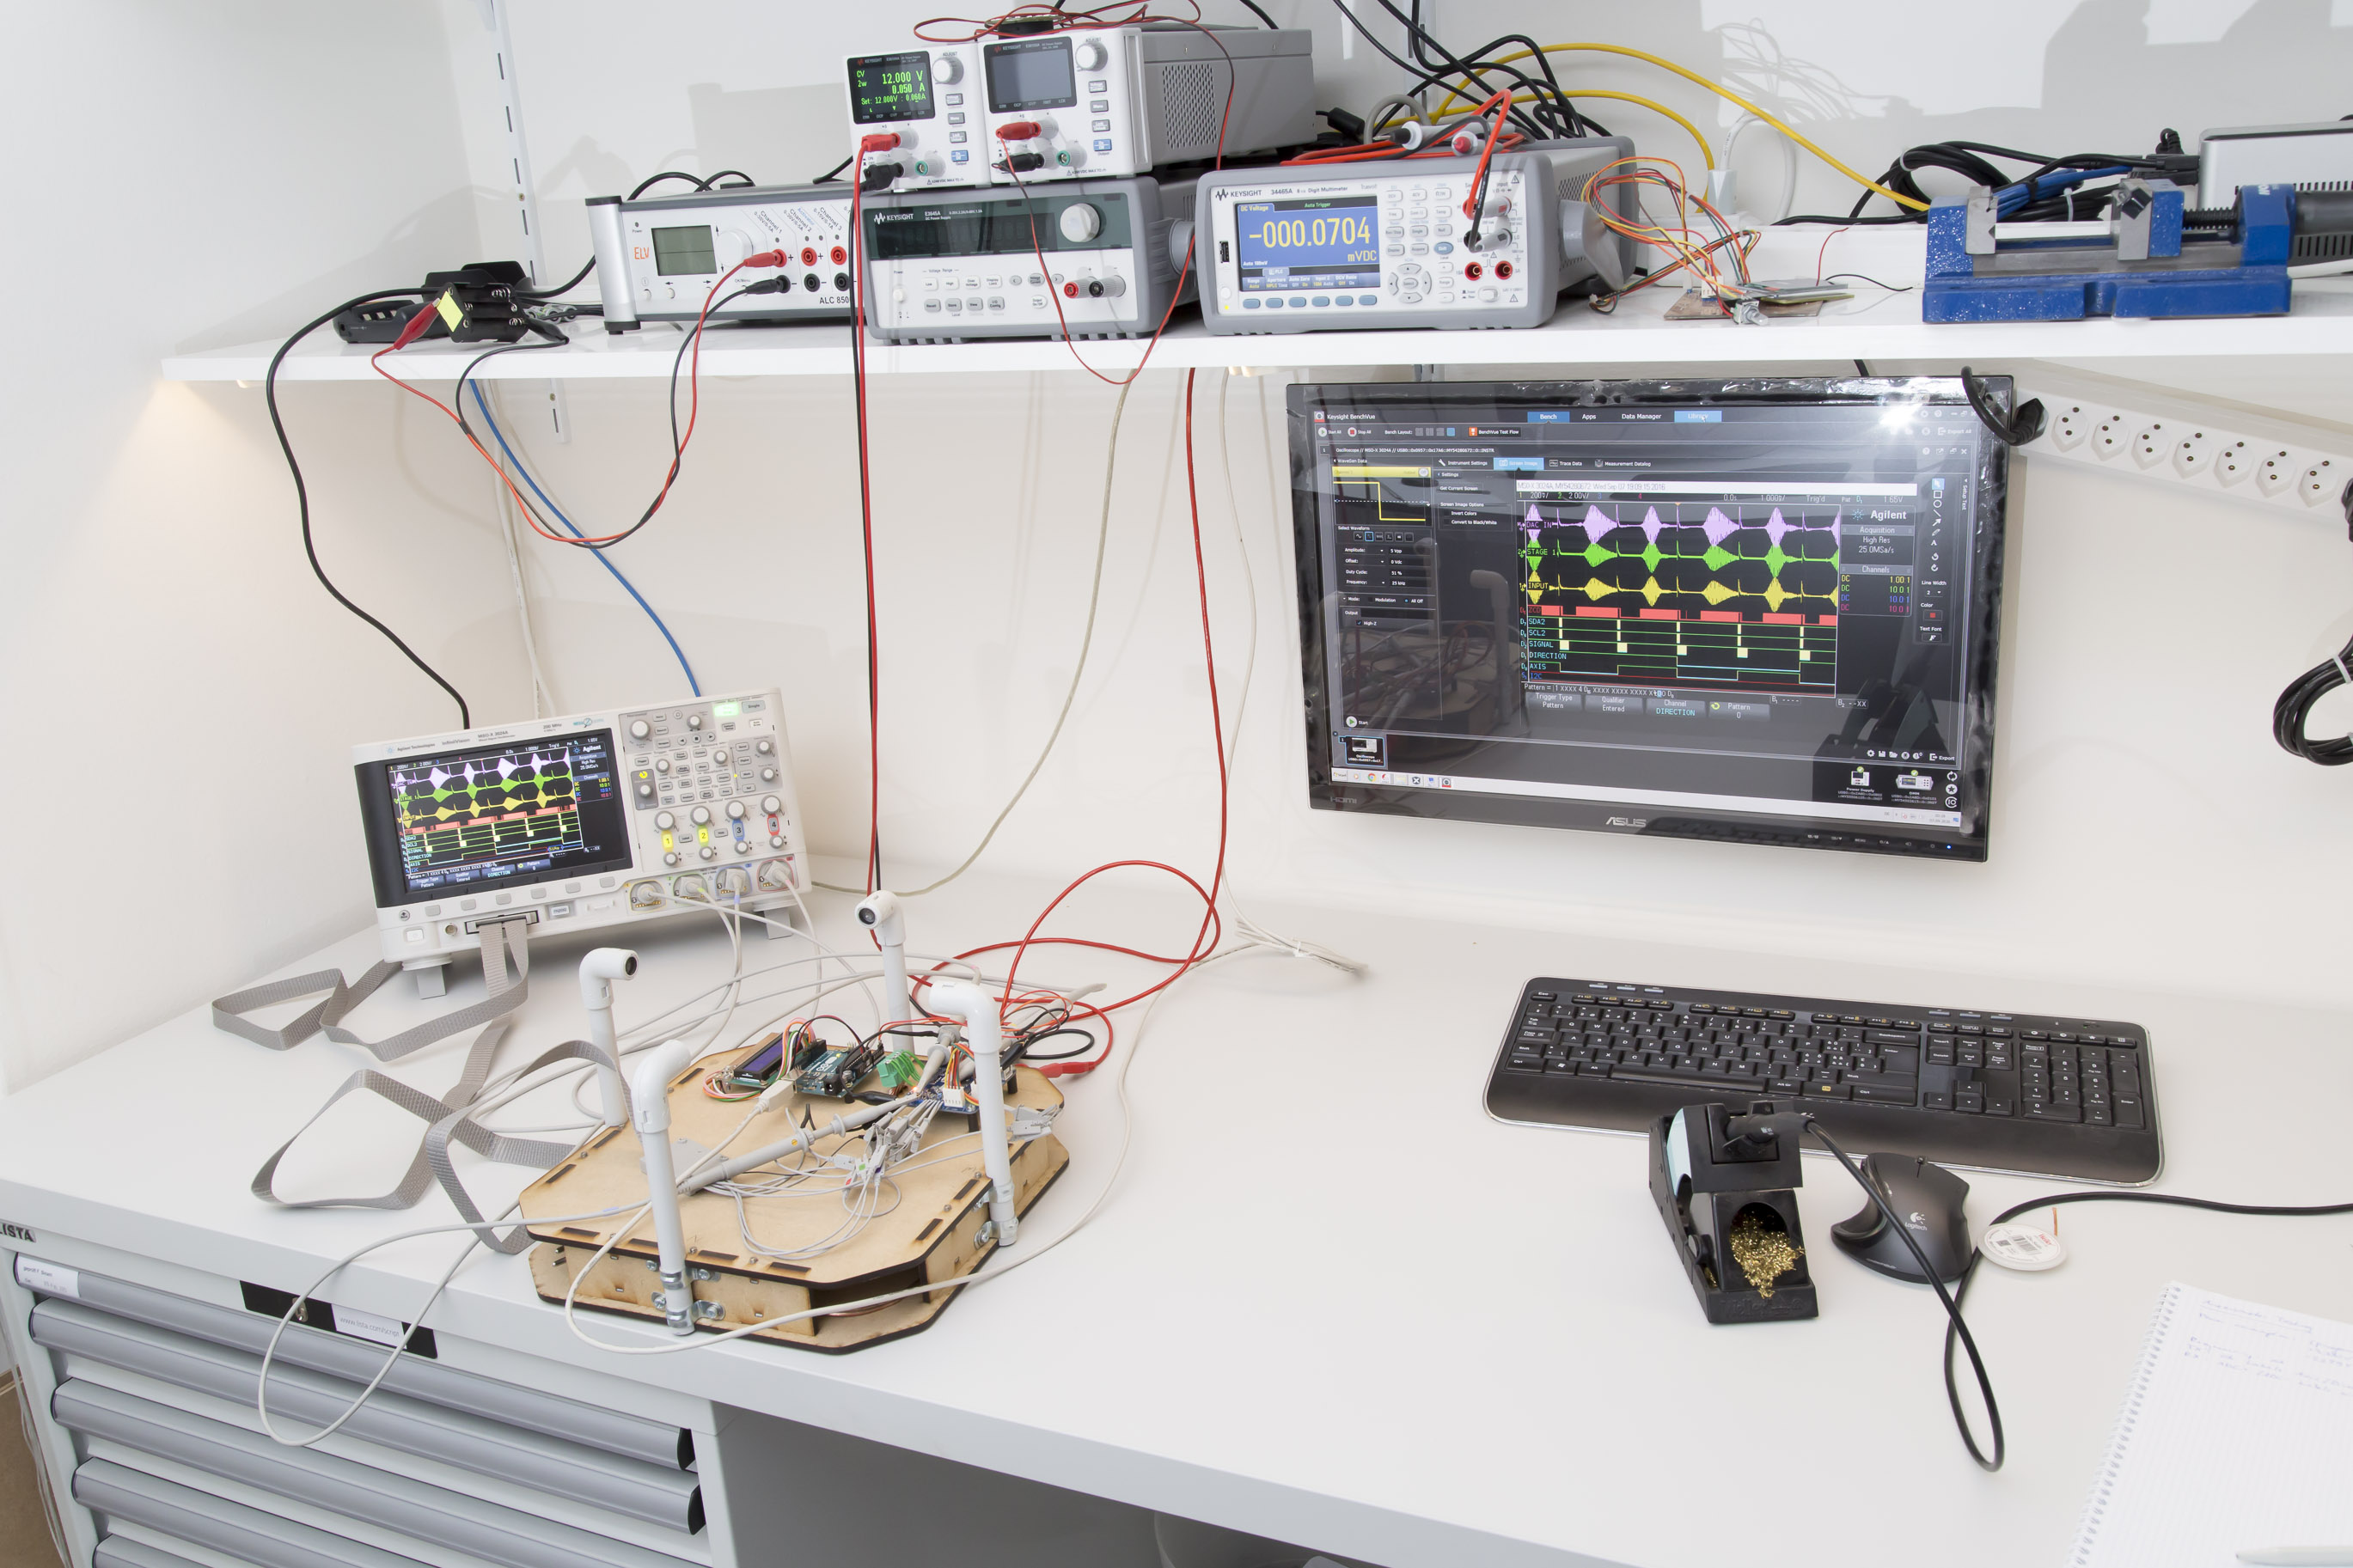 20160907_standaloneanemometer_029 - Electronics-Lab